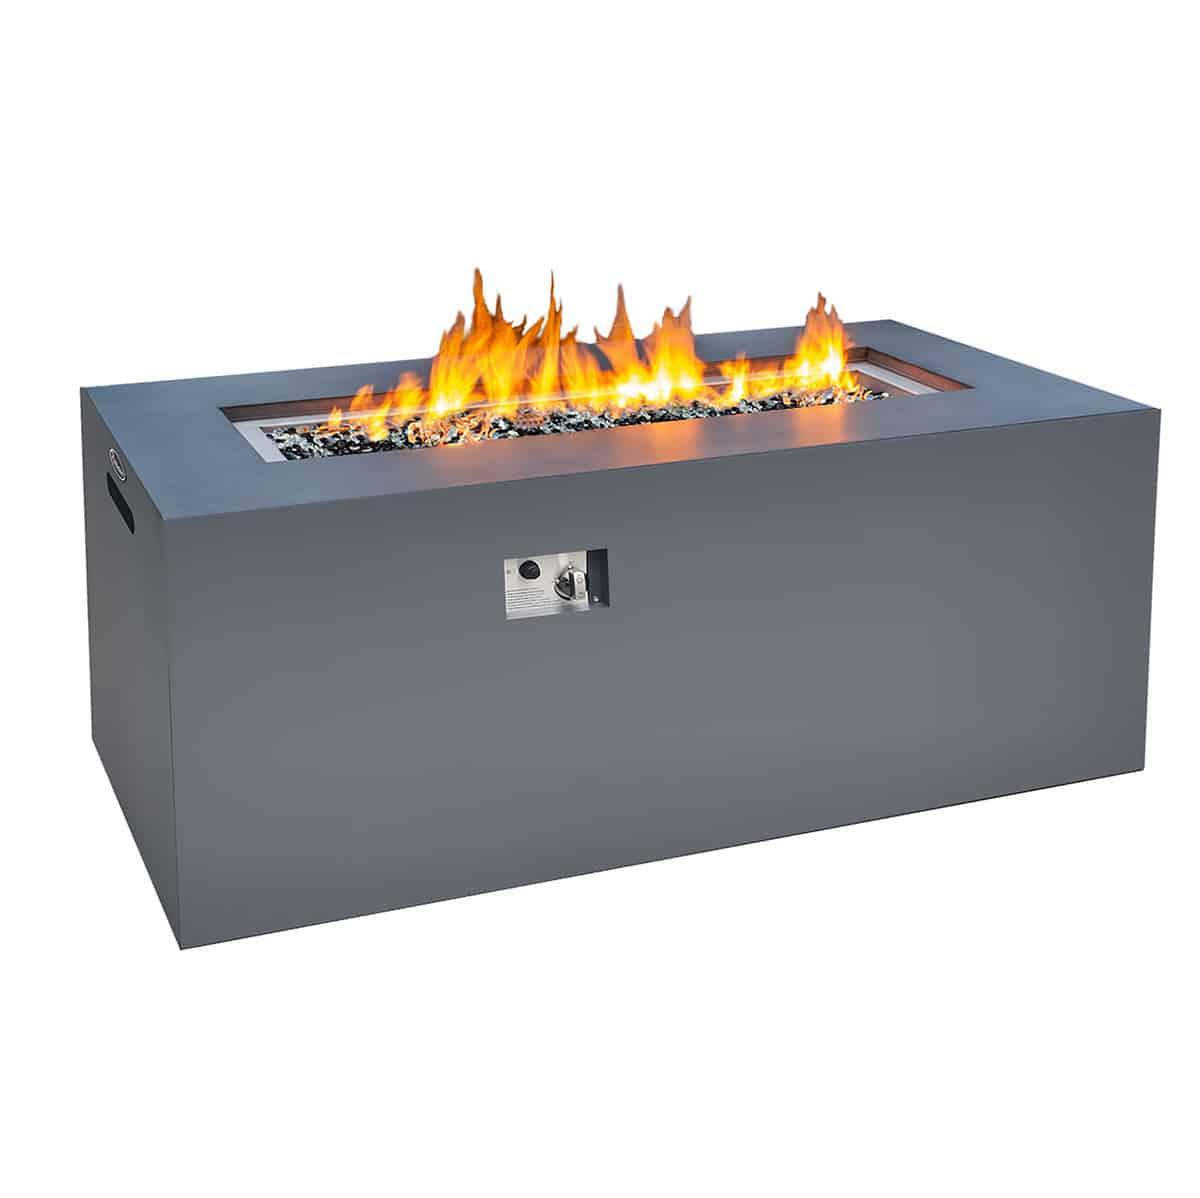 FP-415.media-a-paramount.concrete.look.firetable.aluminum.wb.01